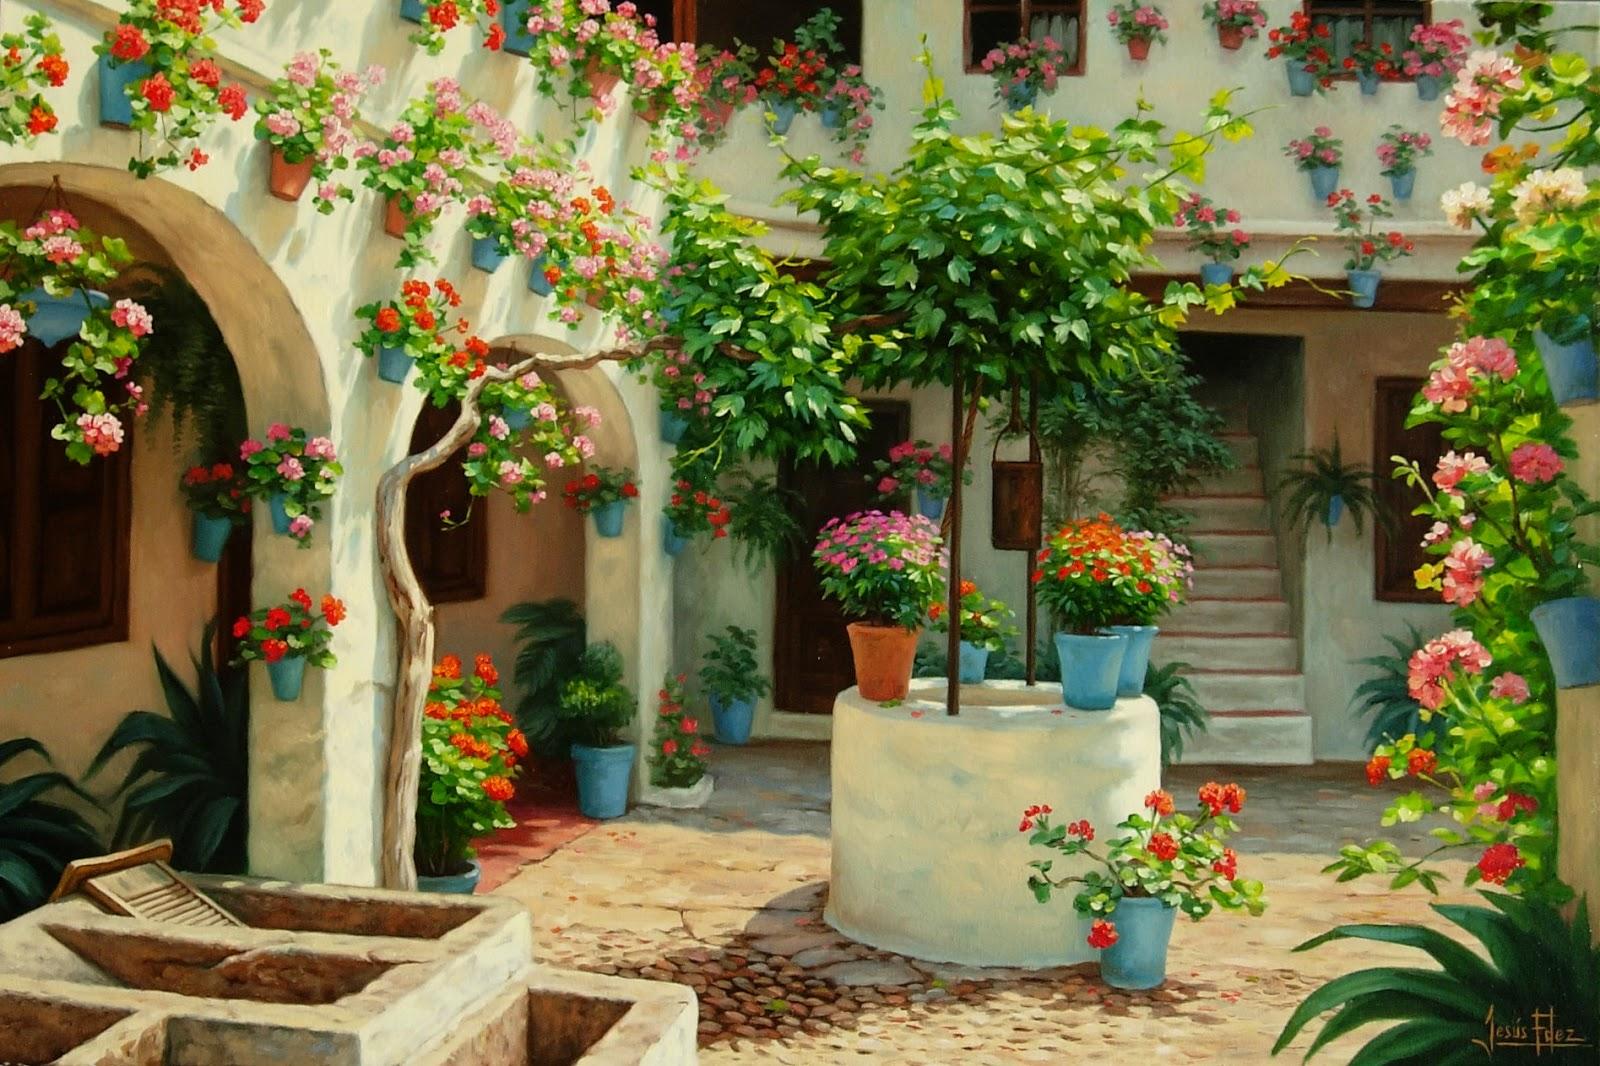 Jes s fern ndez pintor patio cordob s con pozo - Imagenes de patios andaluces ...